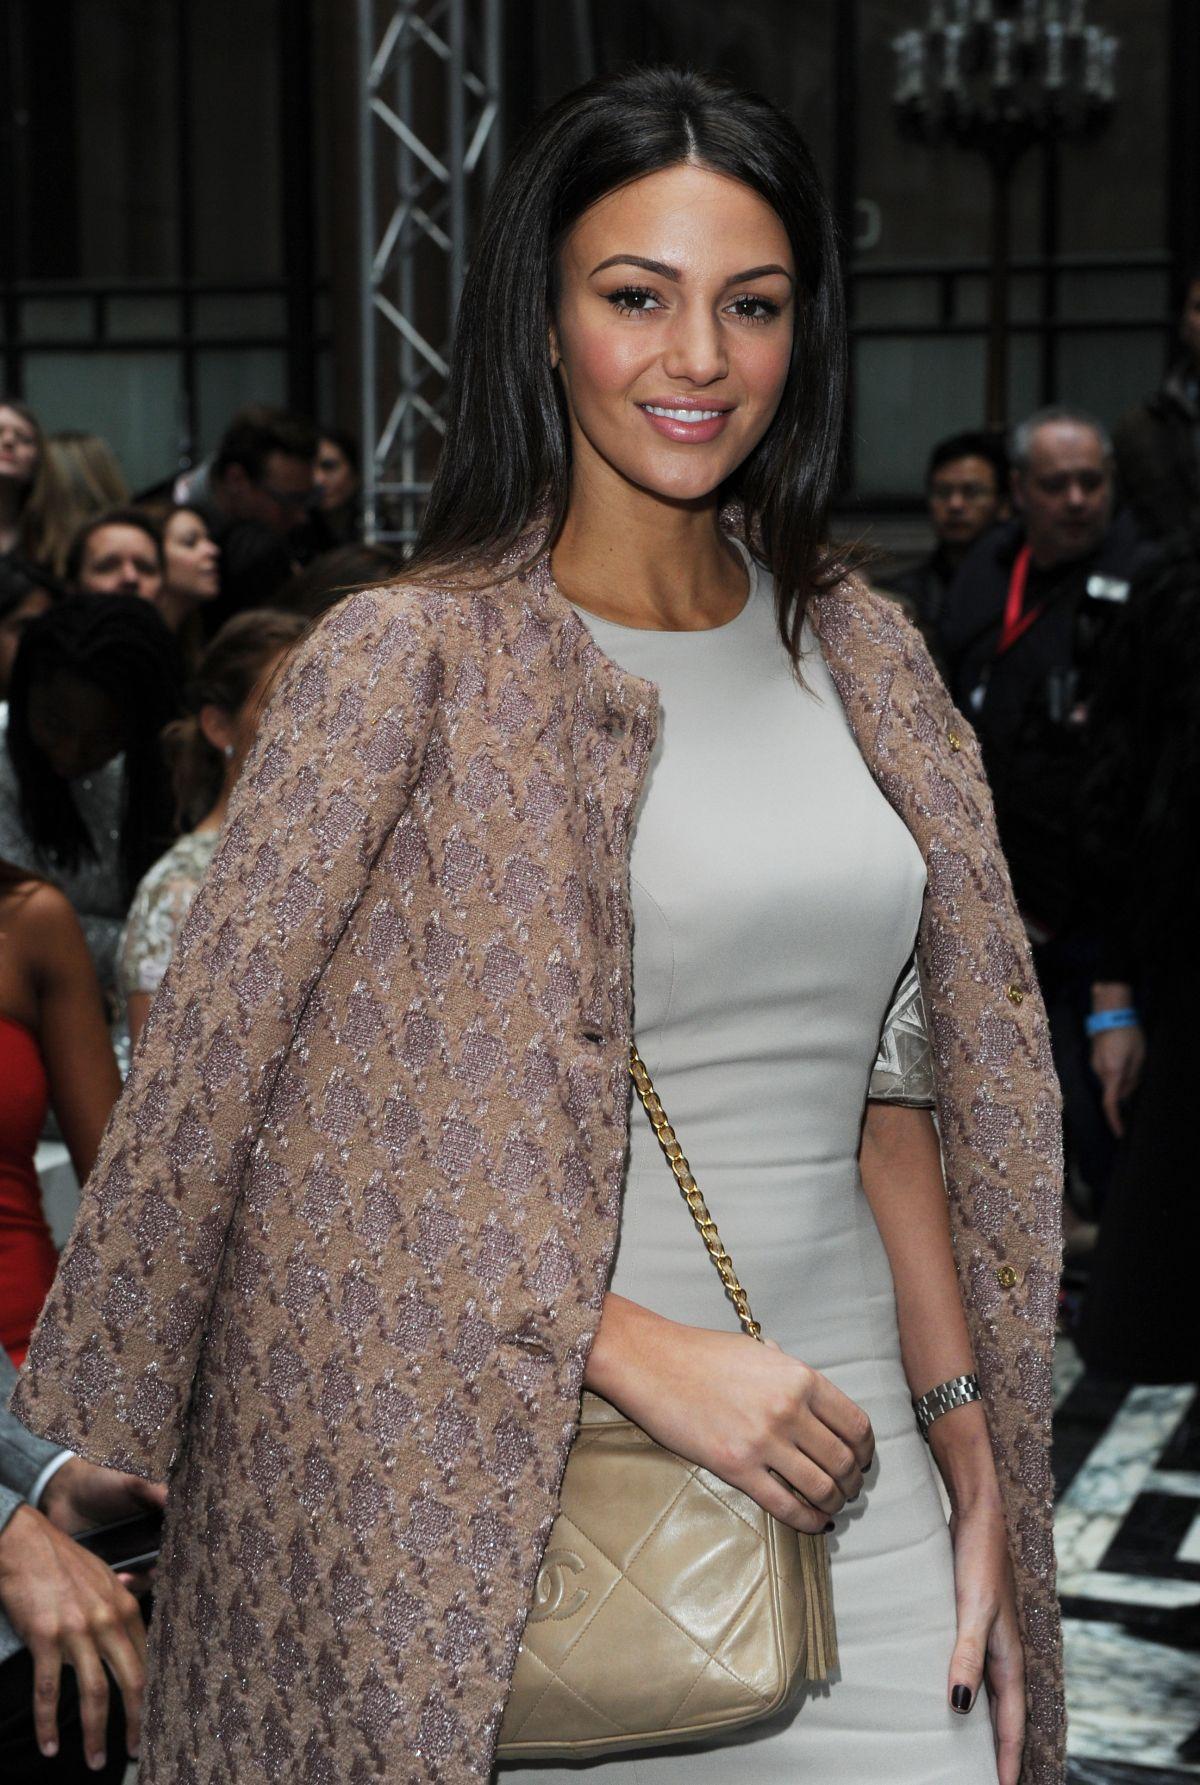 MICHELLE KEEGAN at Julien Macdonald Fashion Show in London